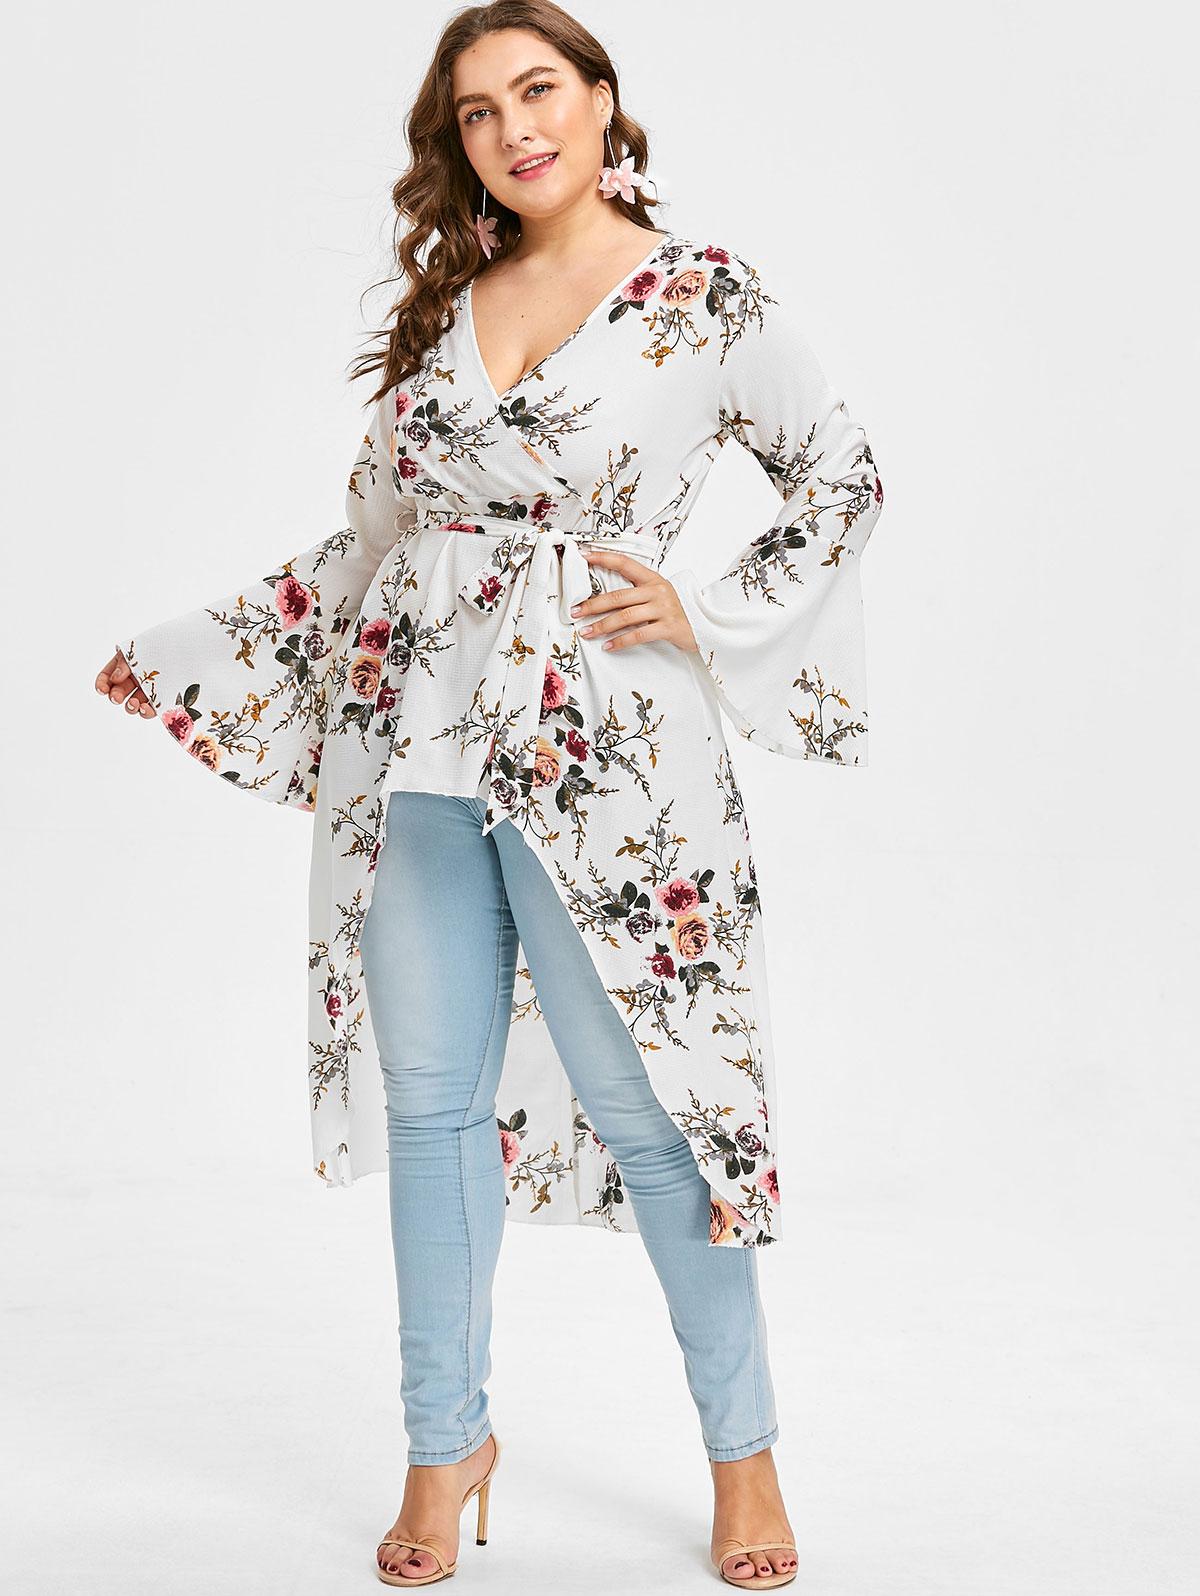 670f62e1fc3 Wipalo Plus Size 4XL Flower Bell Sleeve Blouse Women V Neck Long Sleeve  Long Tops Blouses